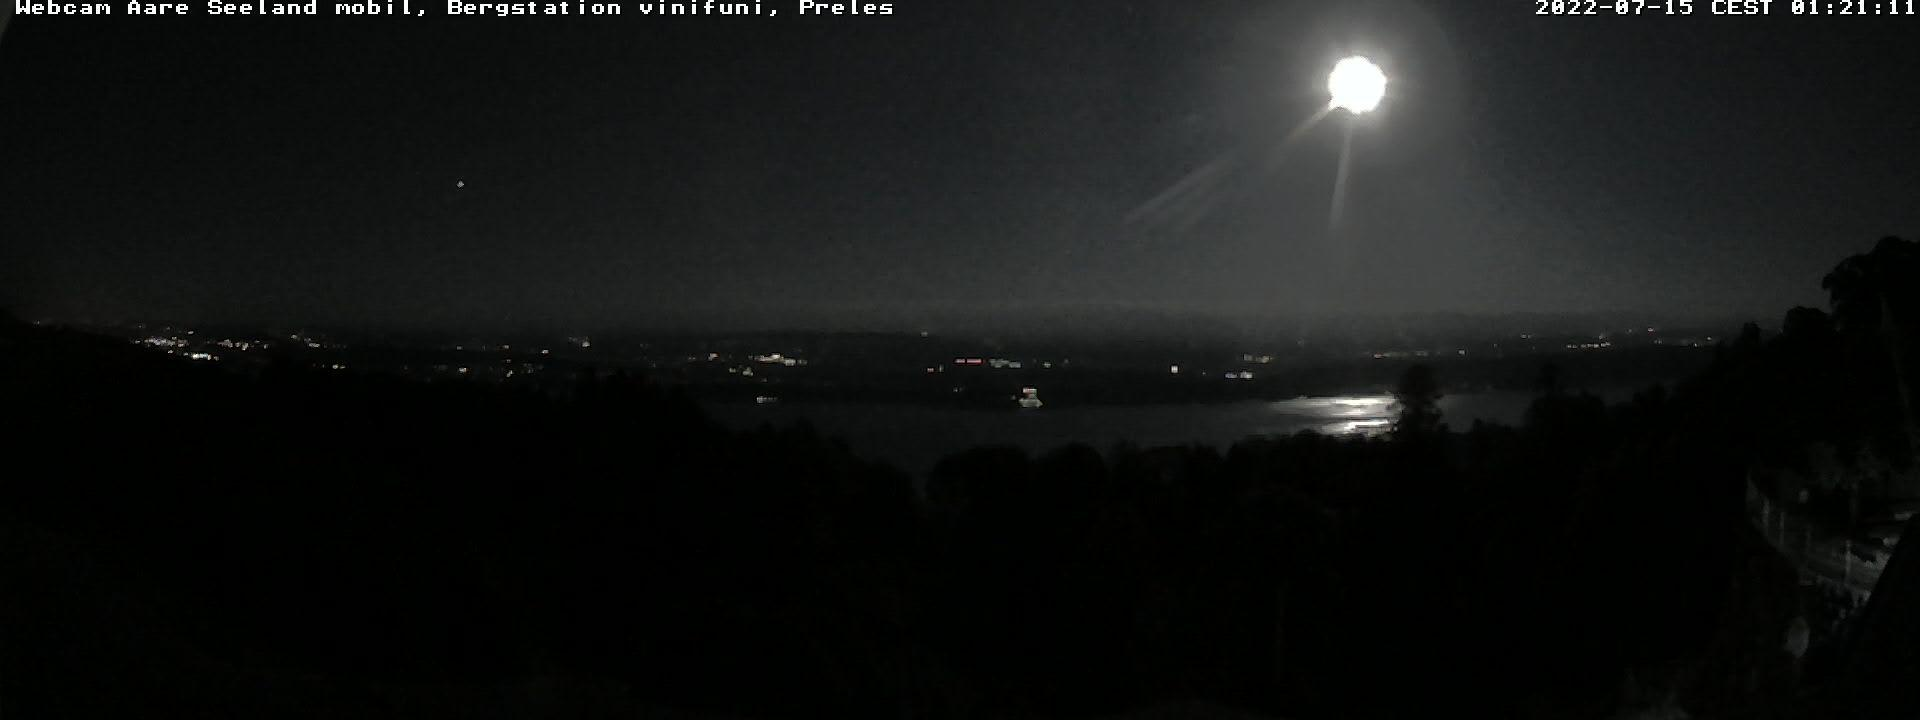 Plateau de Diesse: Vinifuni Bergstation Prêles